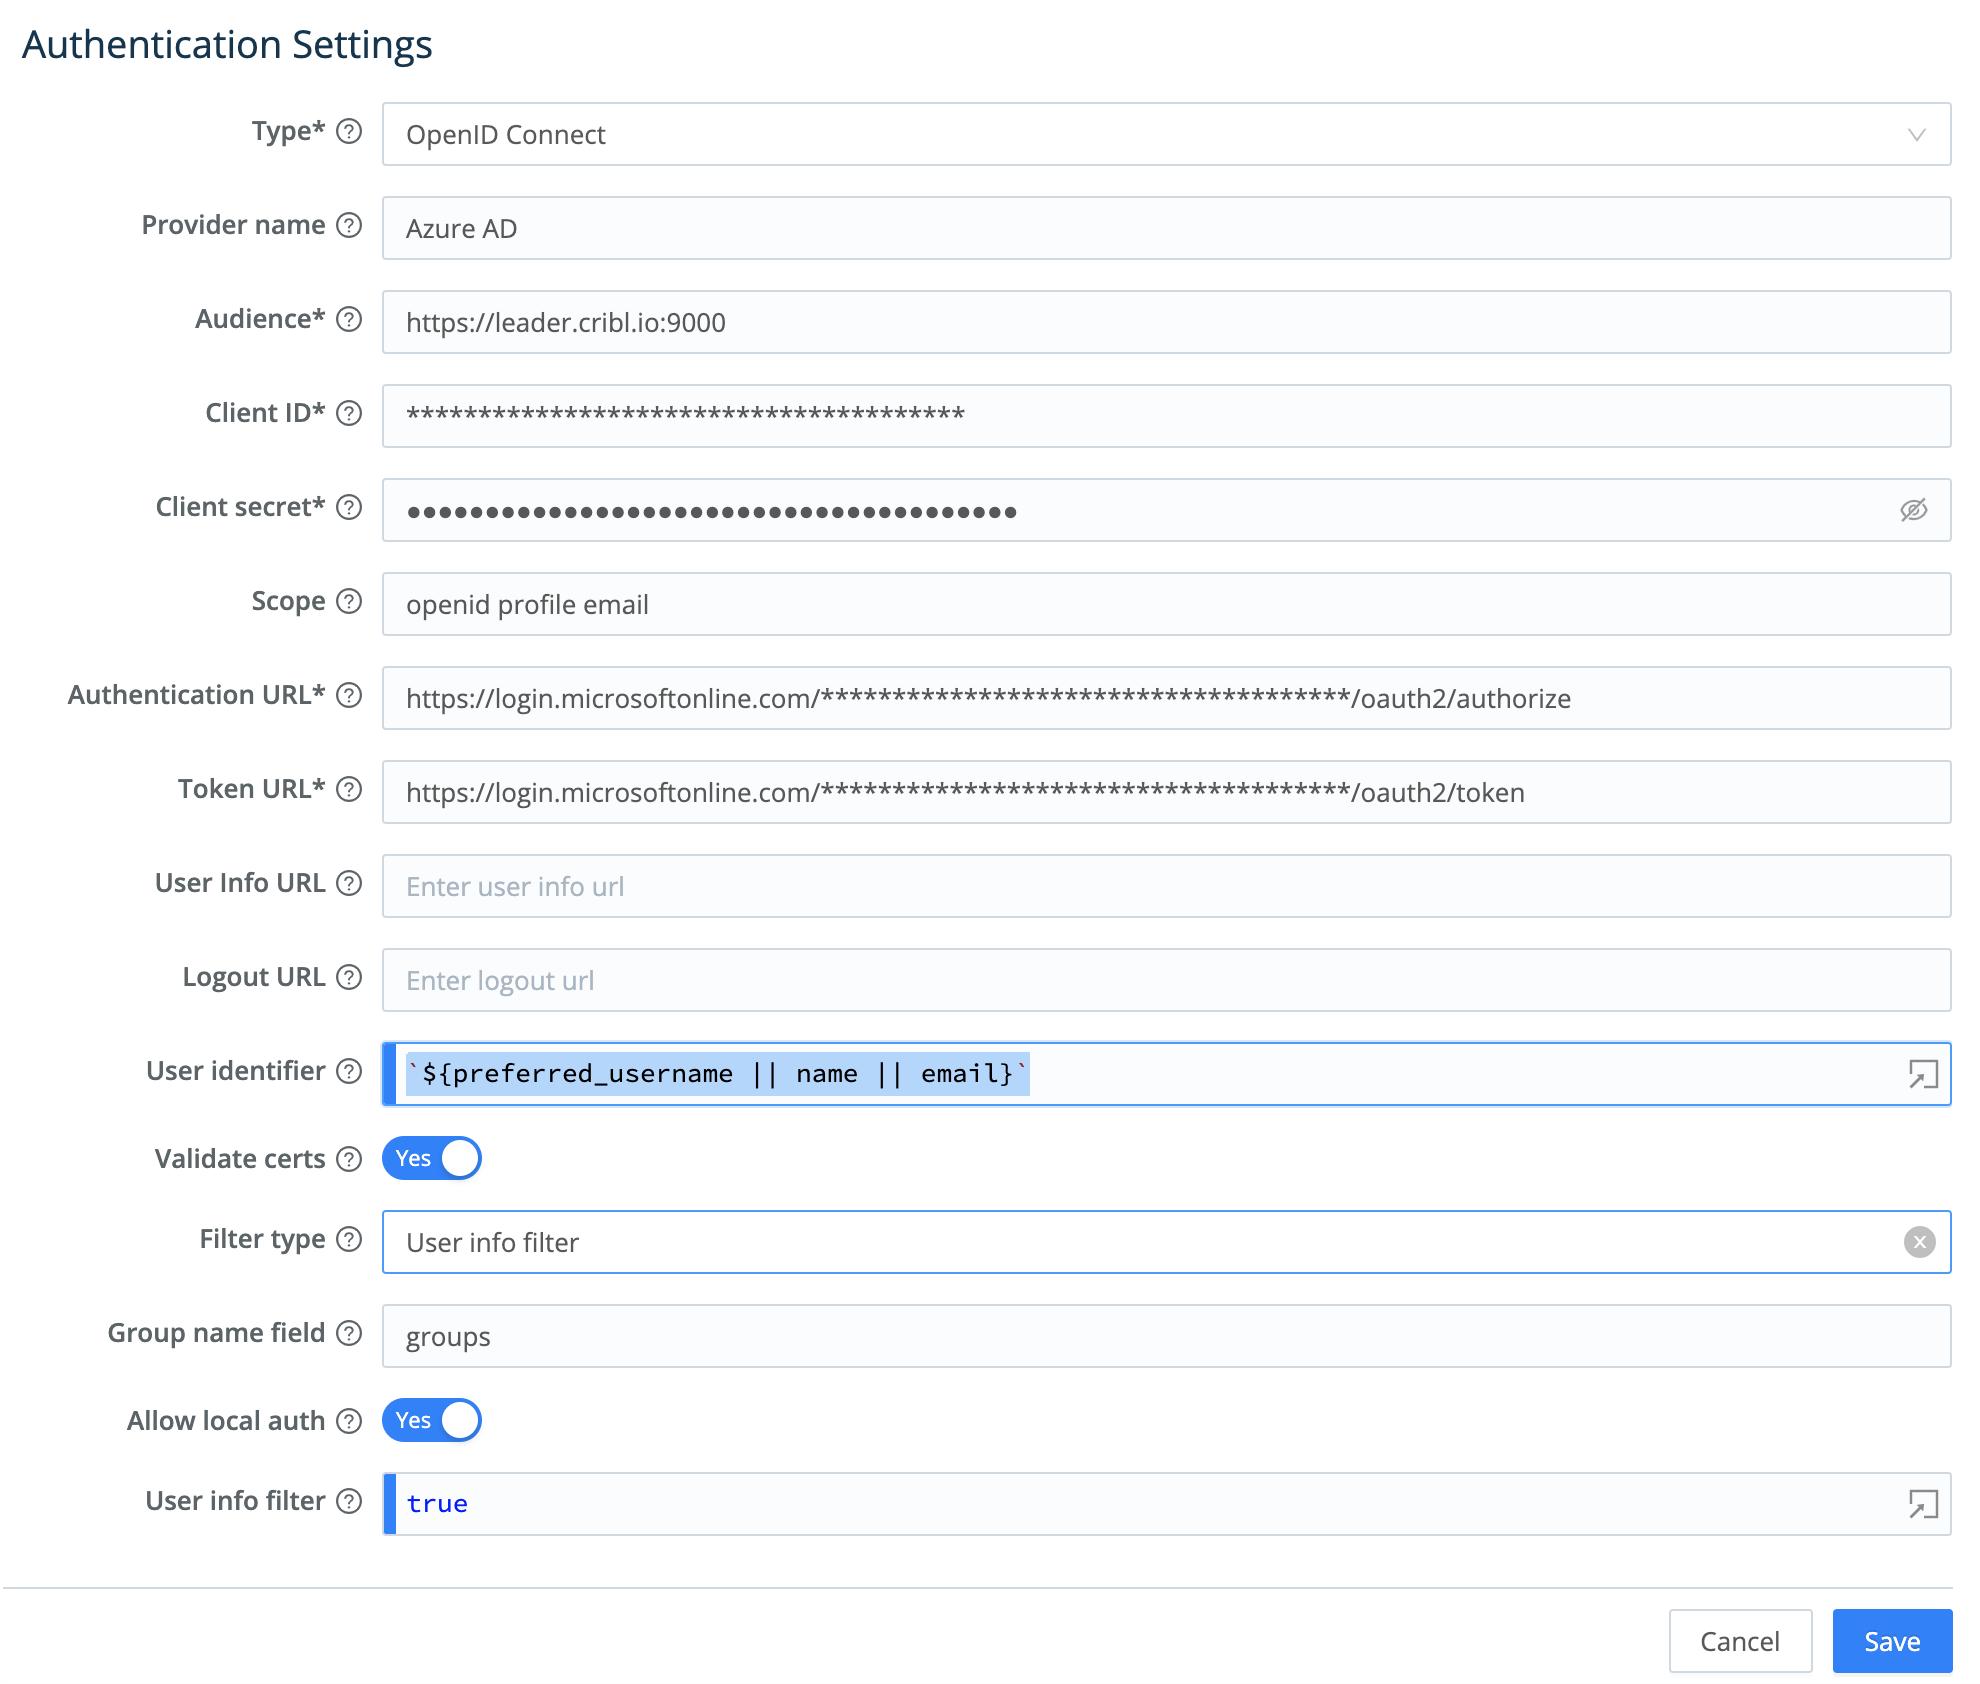 Sample LogStream Authentication Settings for AzureAD (v2 endpoints)